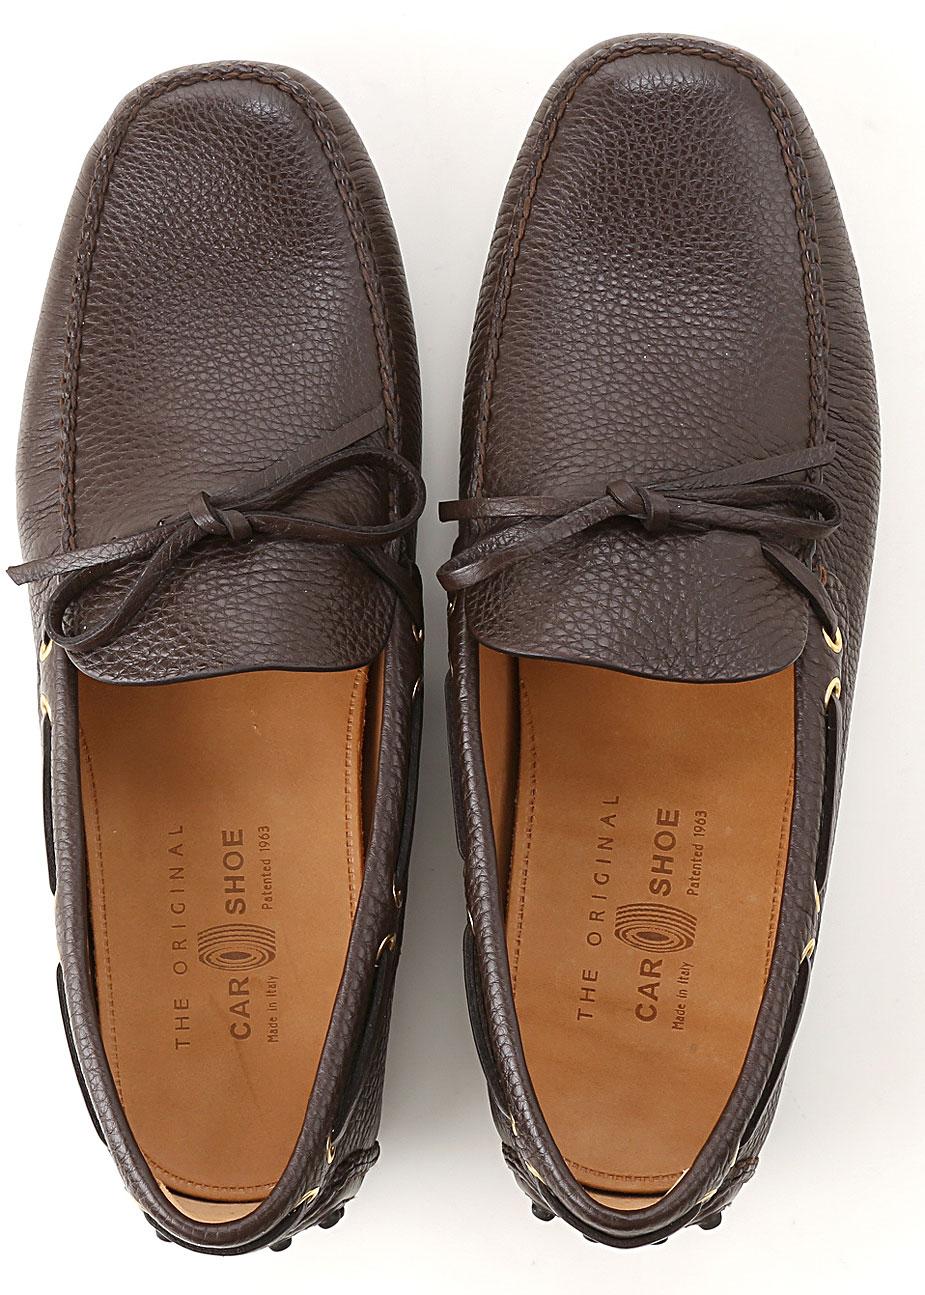 Chaussures Kud006 Xw8 Homme Car Produit Code Aozaw8q F0201 Shoe f6vIgb7Yy